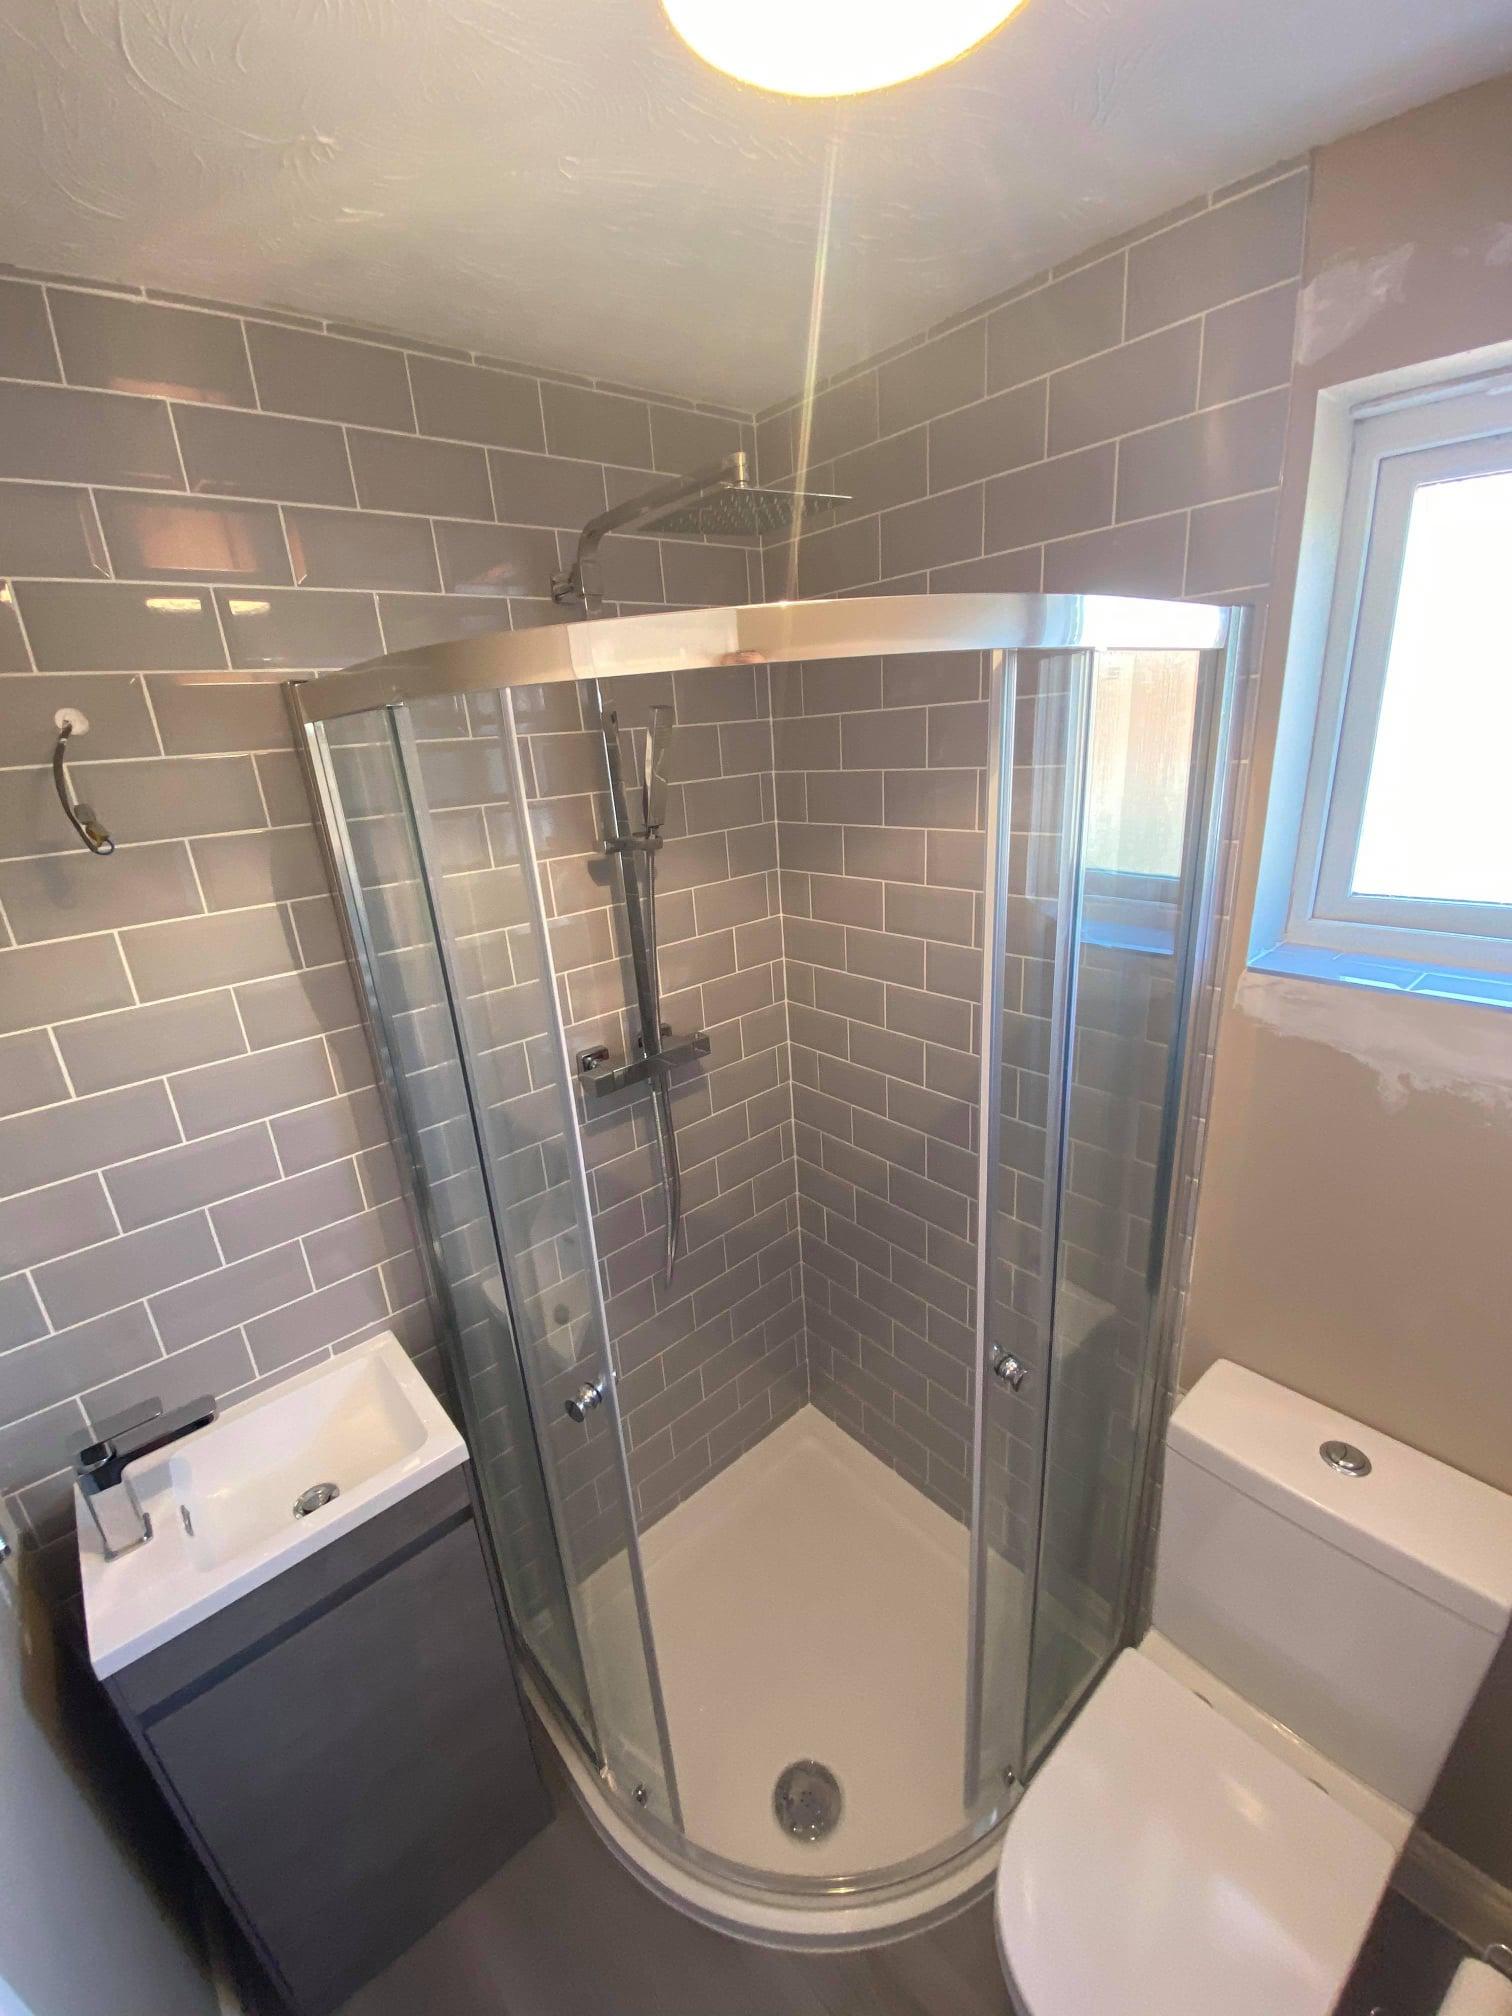 Downstairs W/C & Bathroom Refit